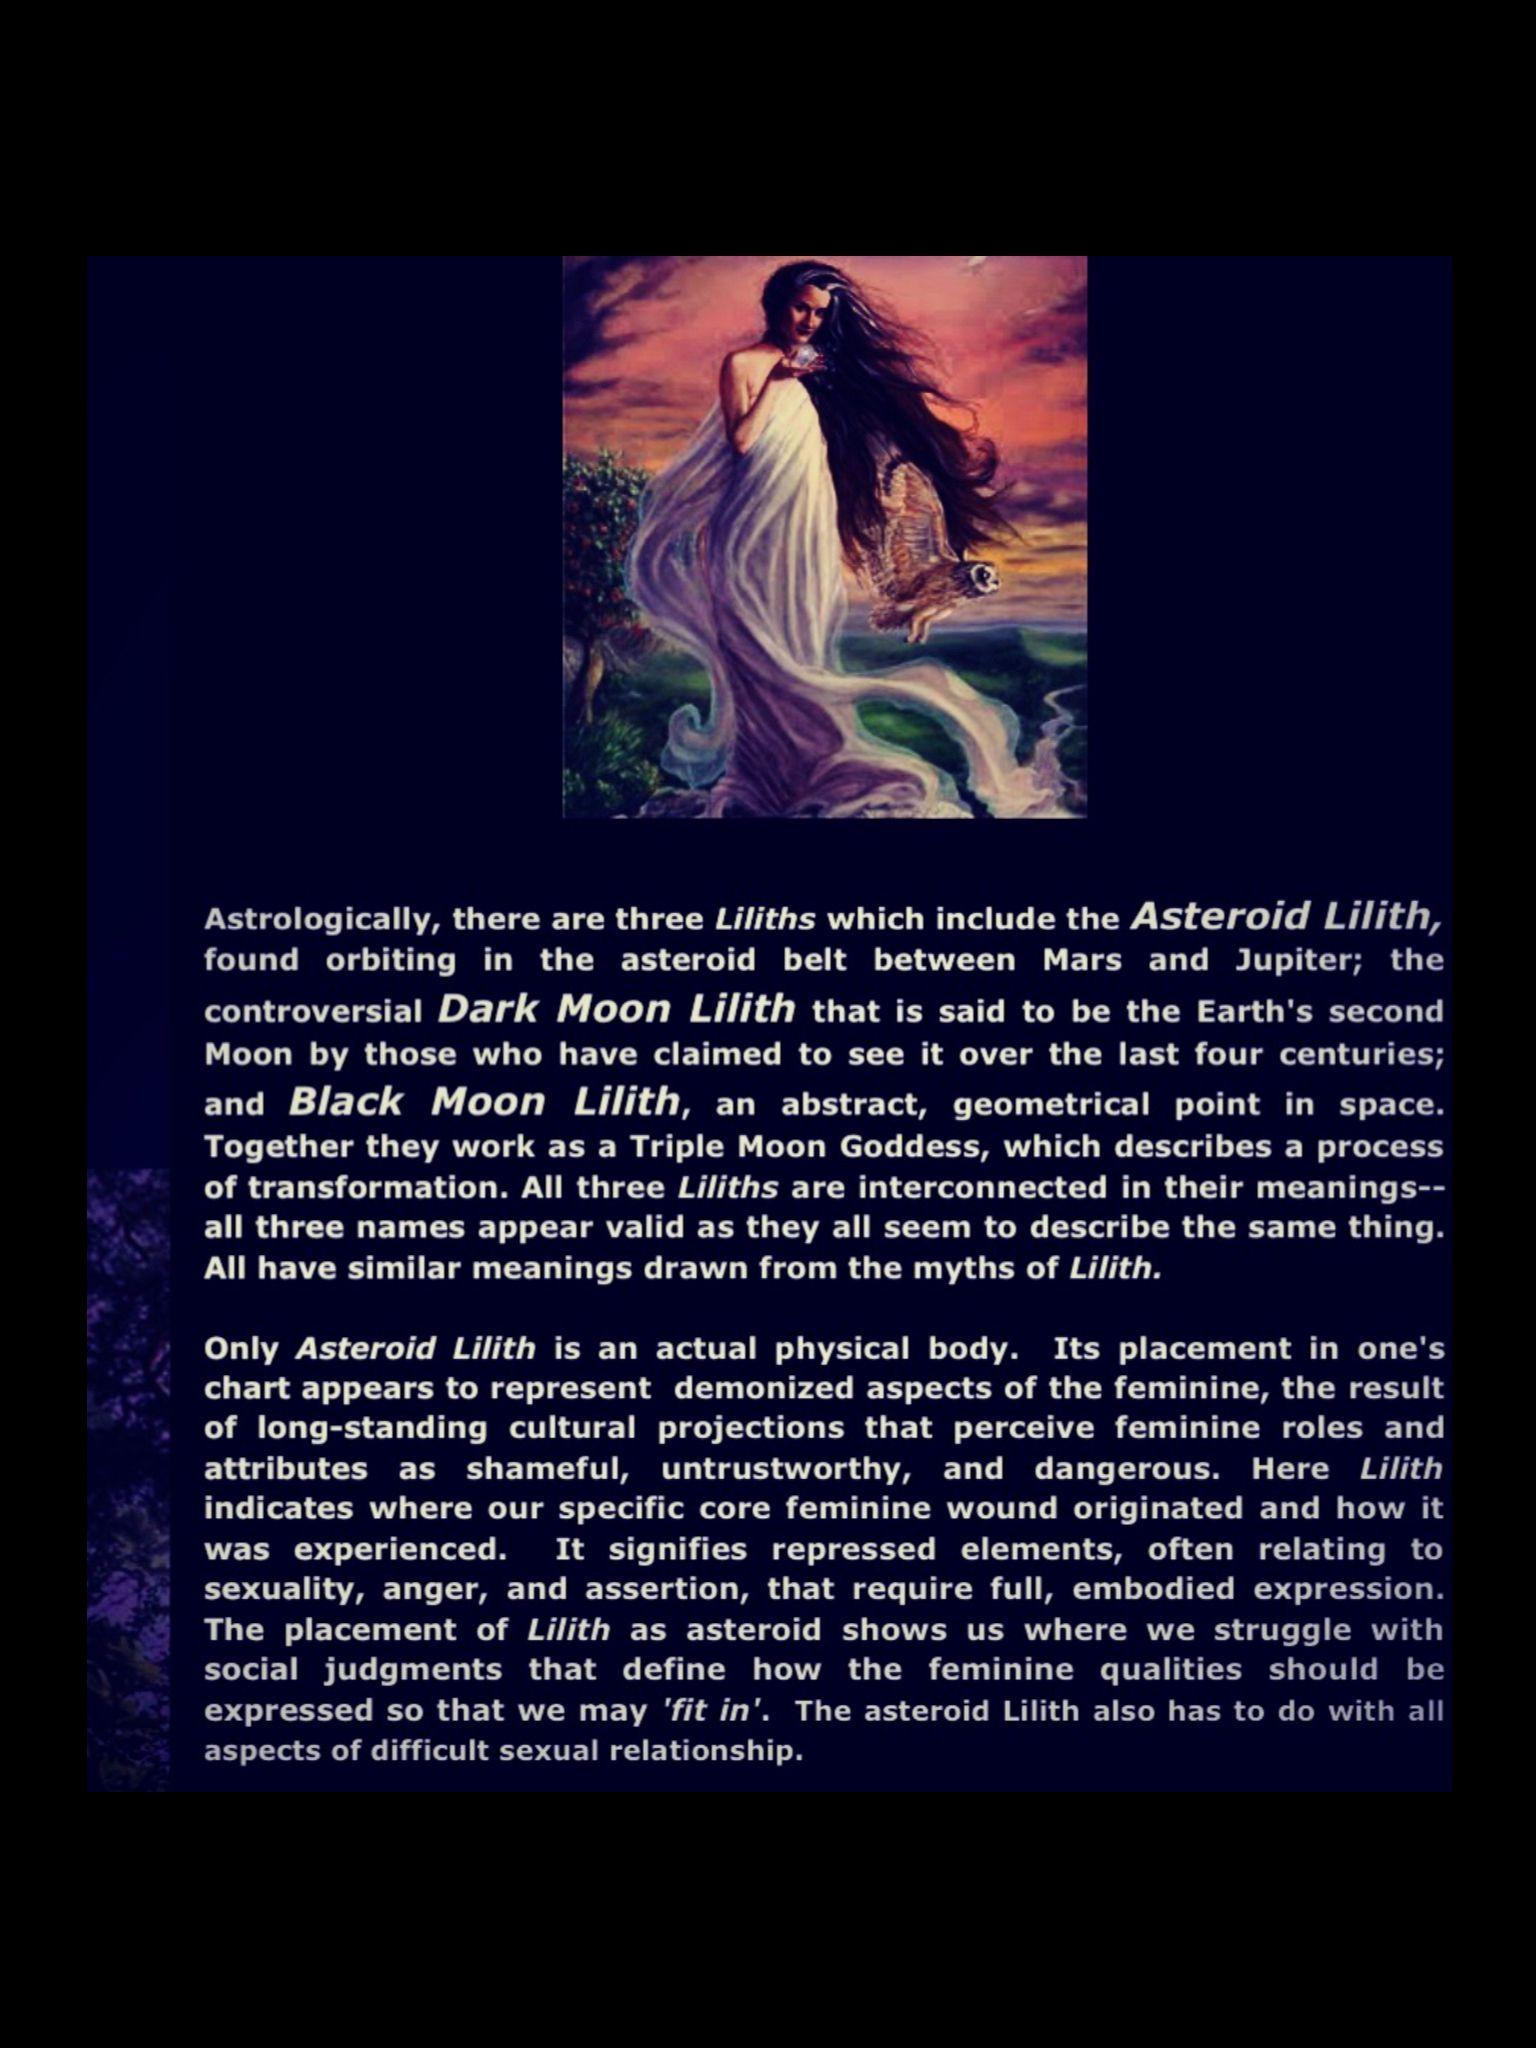 Astrology) Lilith (Black moon) (Dark moon) (Asteroid 1181/Lilith